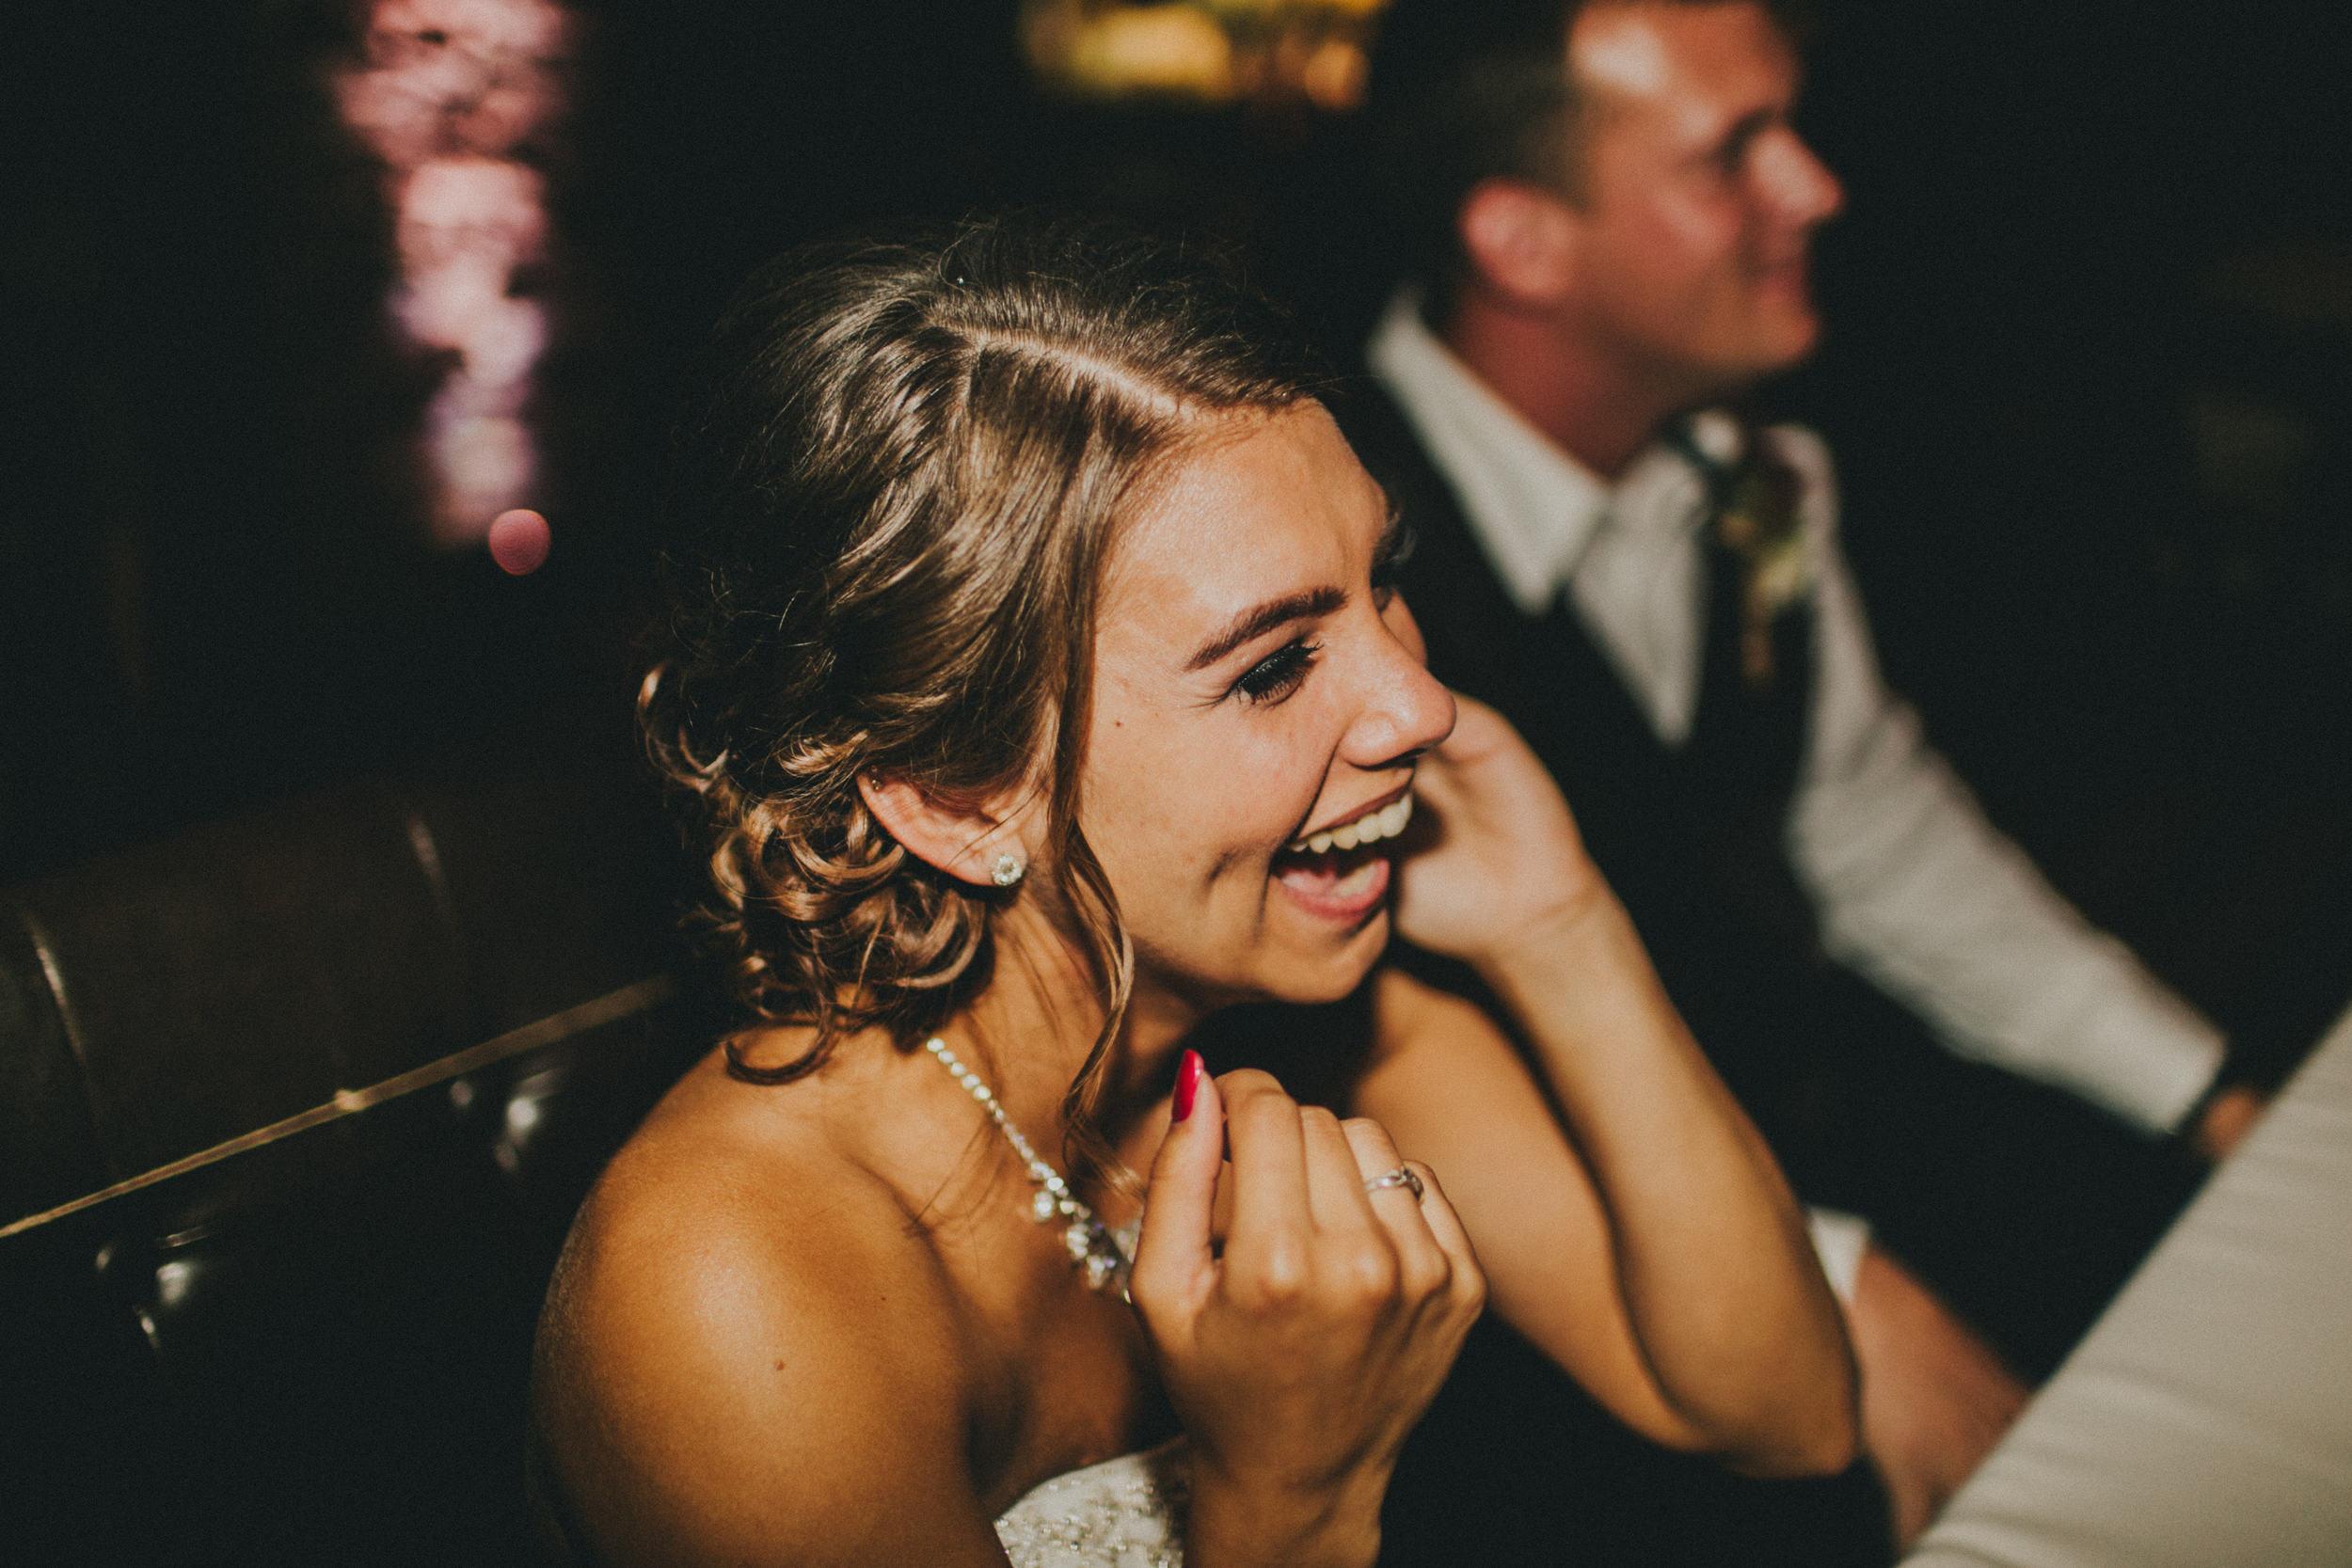 Cheyenne + Jordan - Wedding, Natalie Griffo (111 of 157).jpg